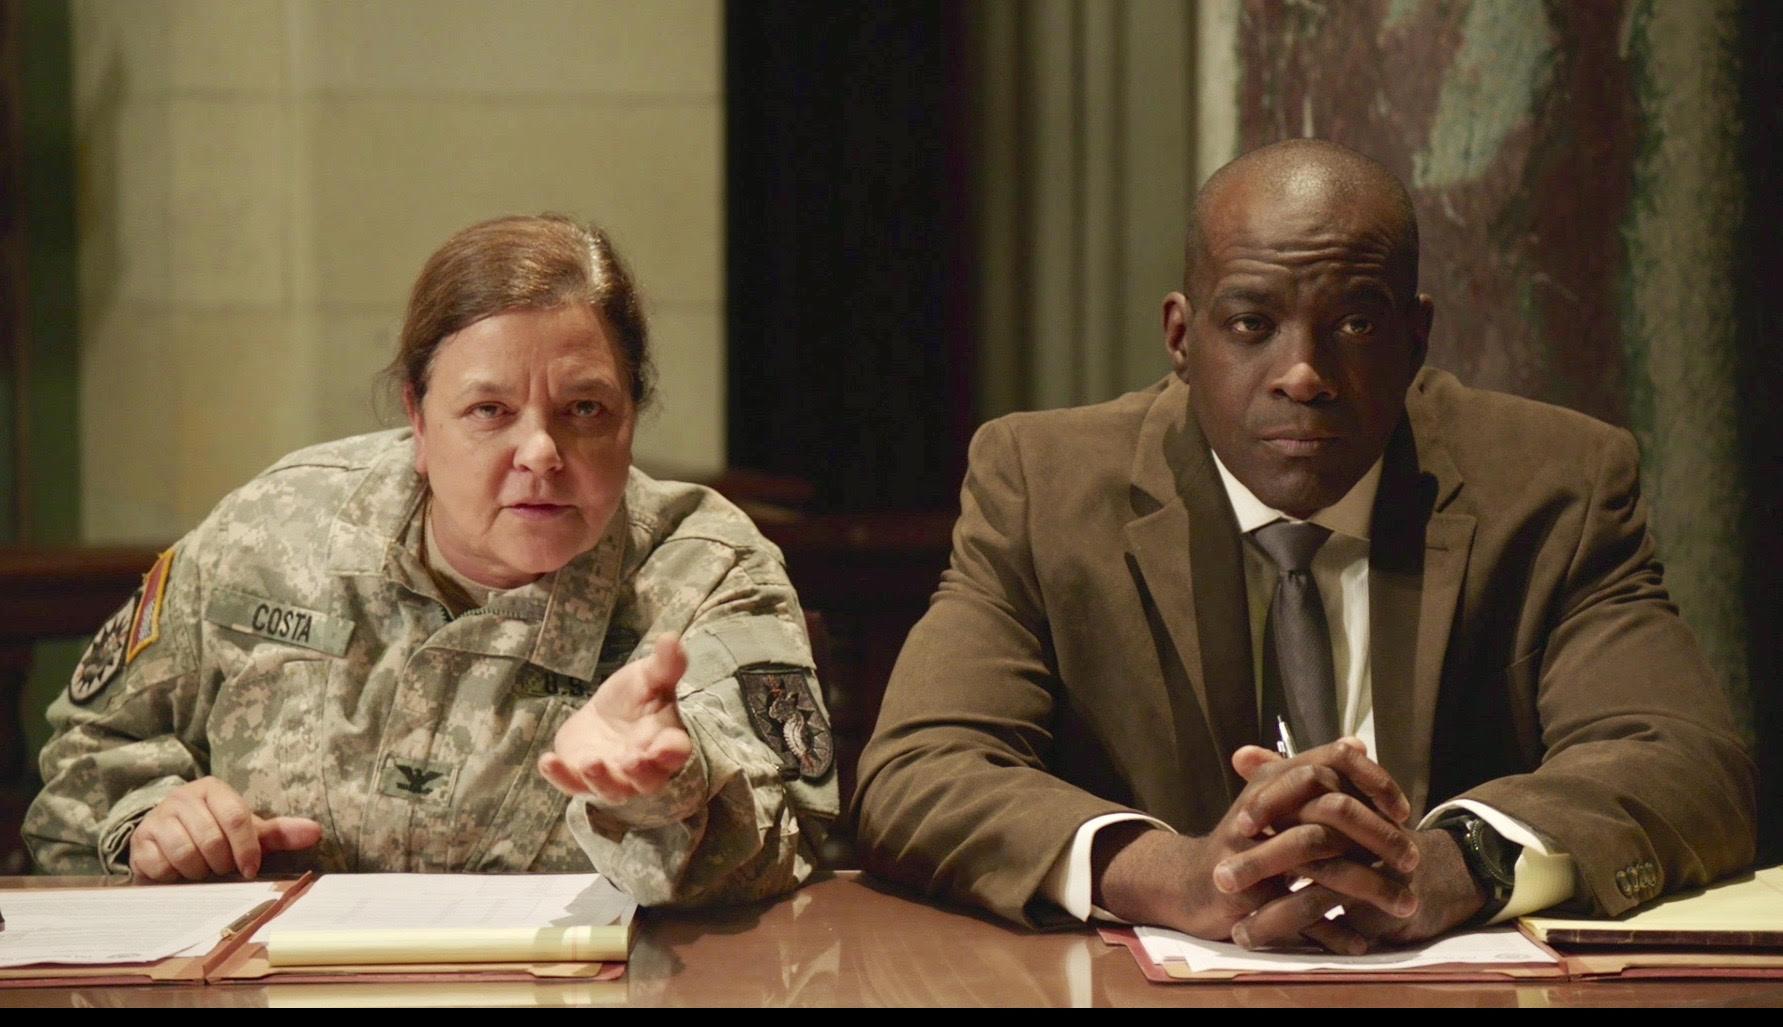 Ret. Colonel / actress Lisa Costanza and actor Marlon Sanders in MIRROR IMAGE.